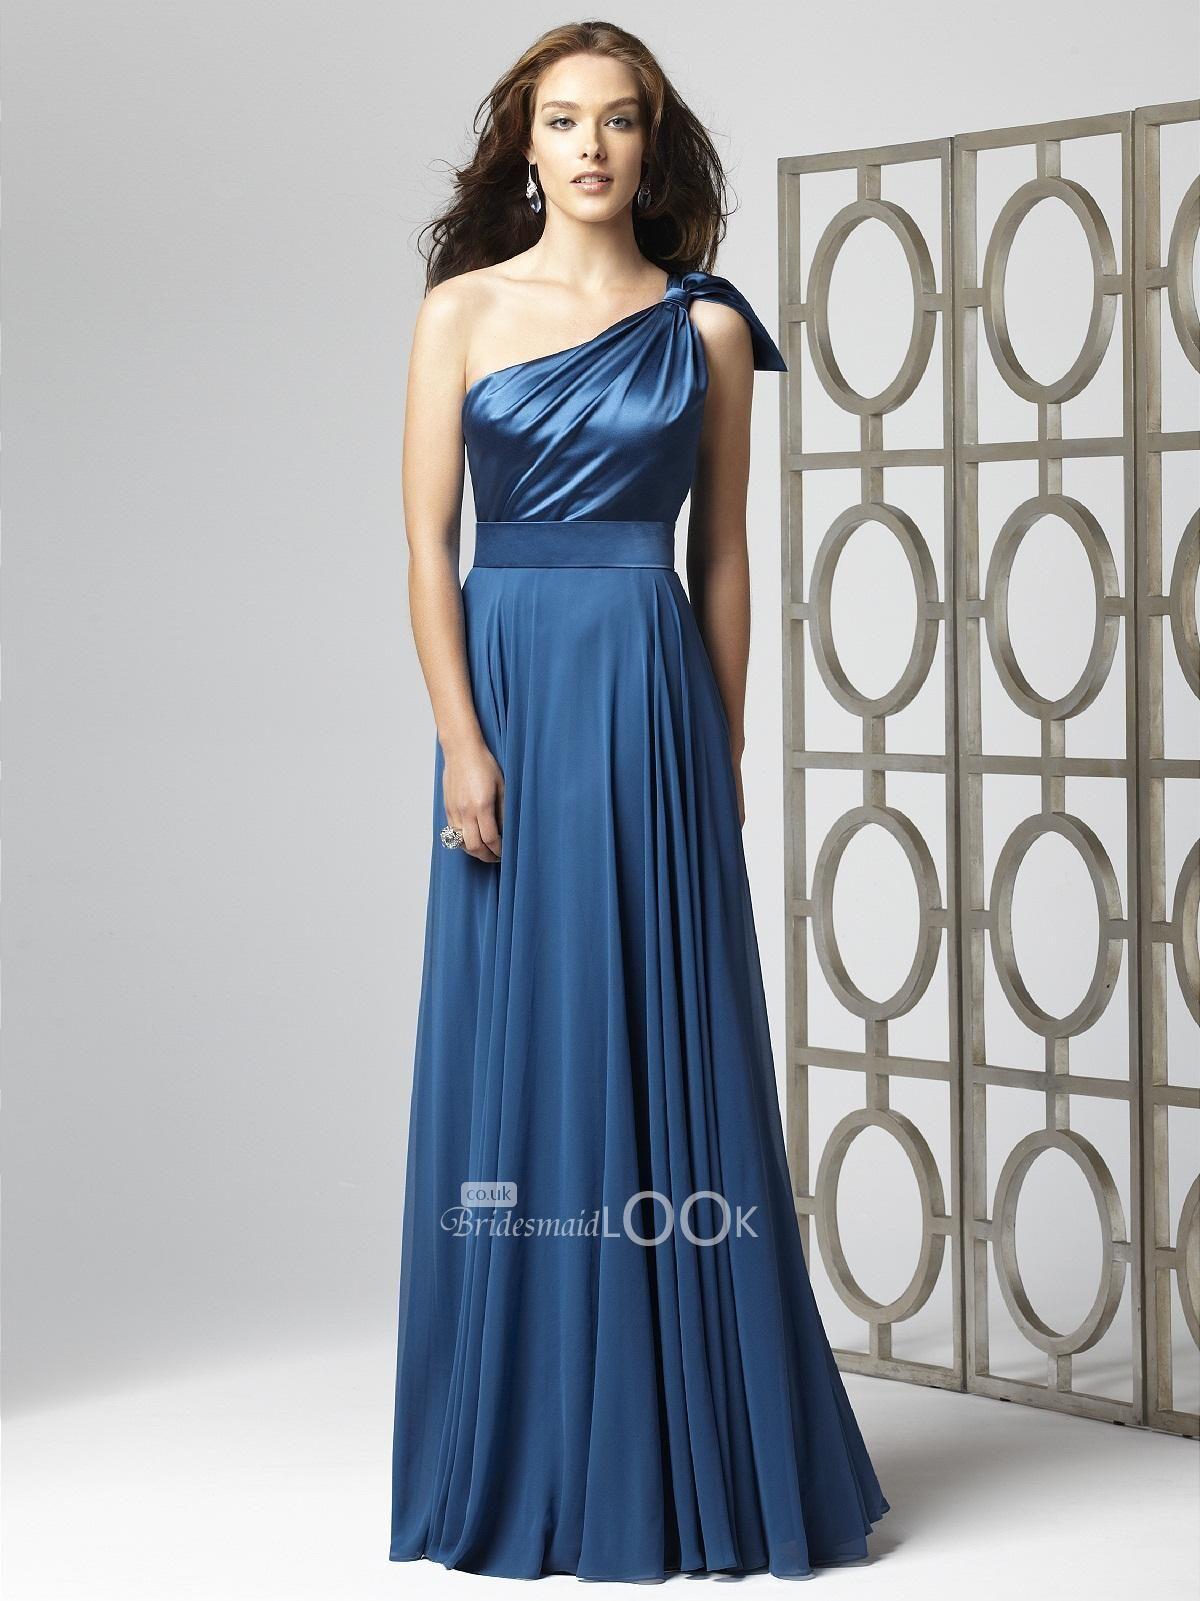 2f221530d8 Chiffon One Shoulder Long Bridesmaid Dress - Data Dynamic AG